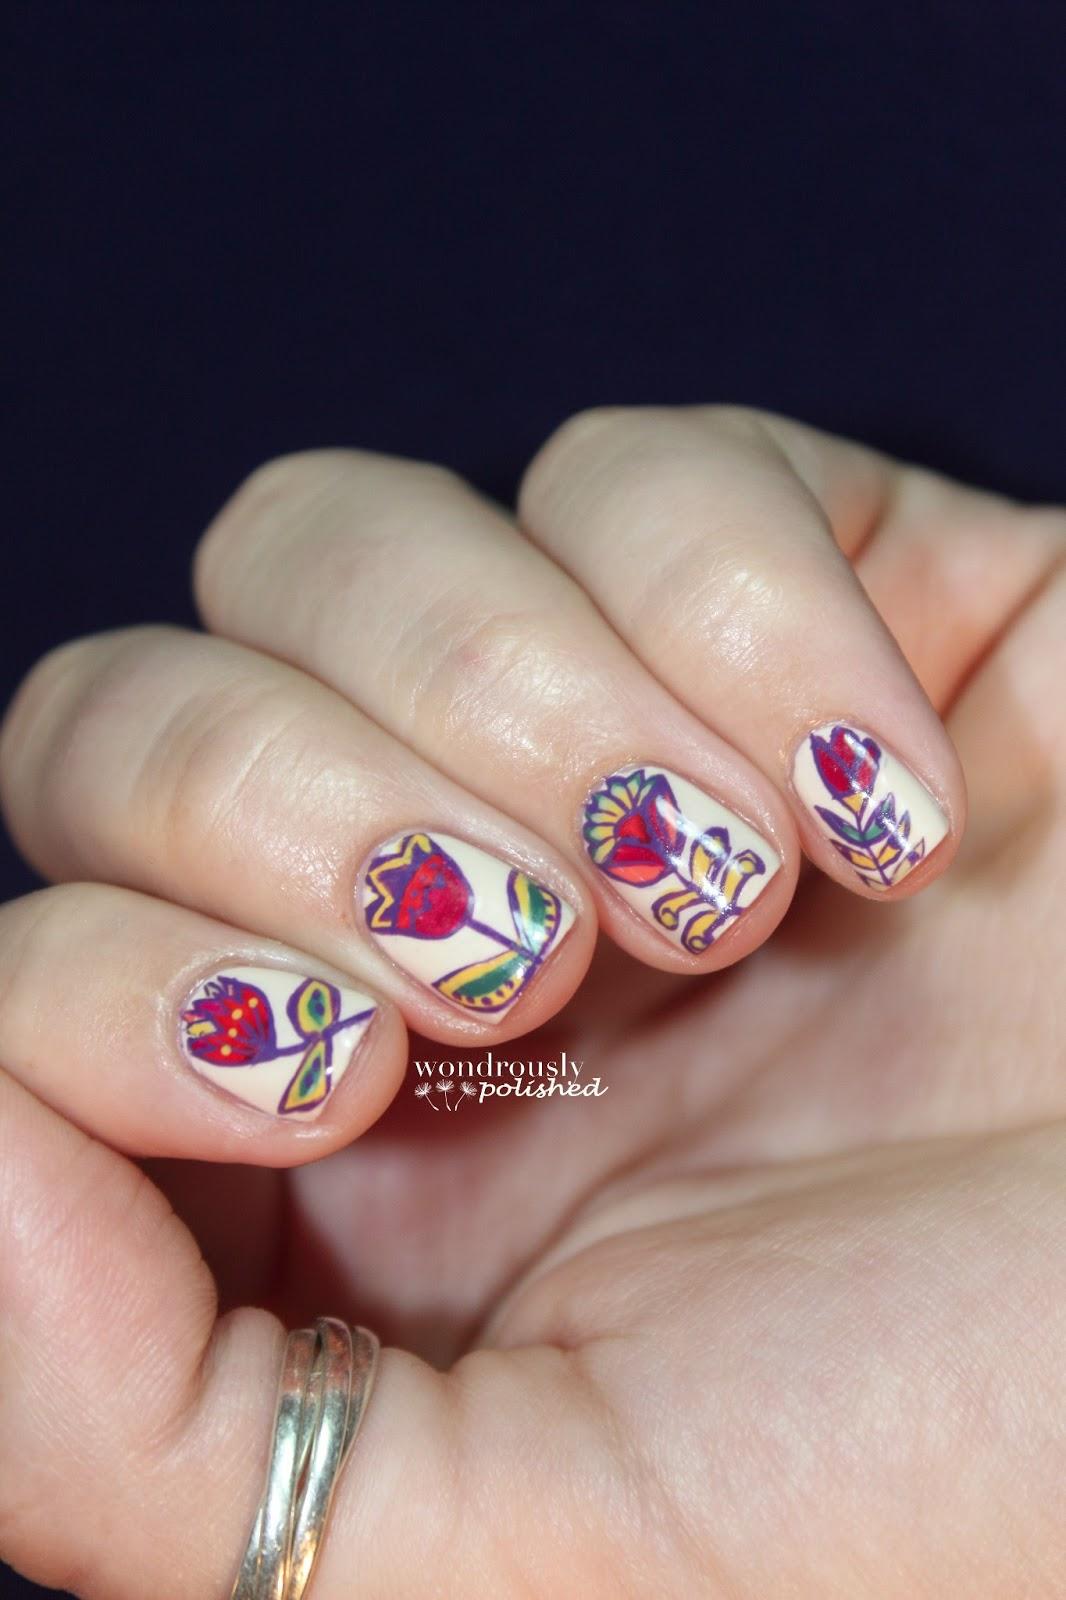 Wondrously Polished April Nail Art Challenge: Wondrously Polished: Funky Floral